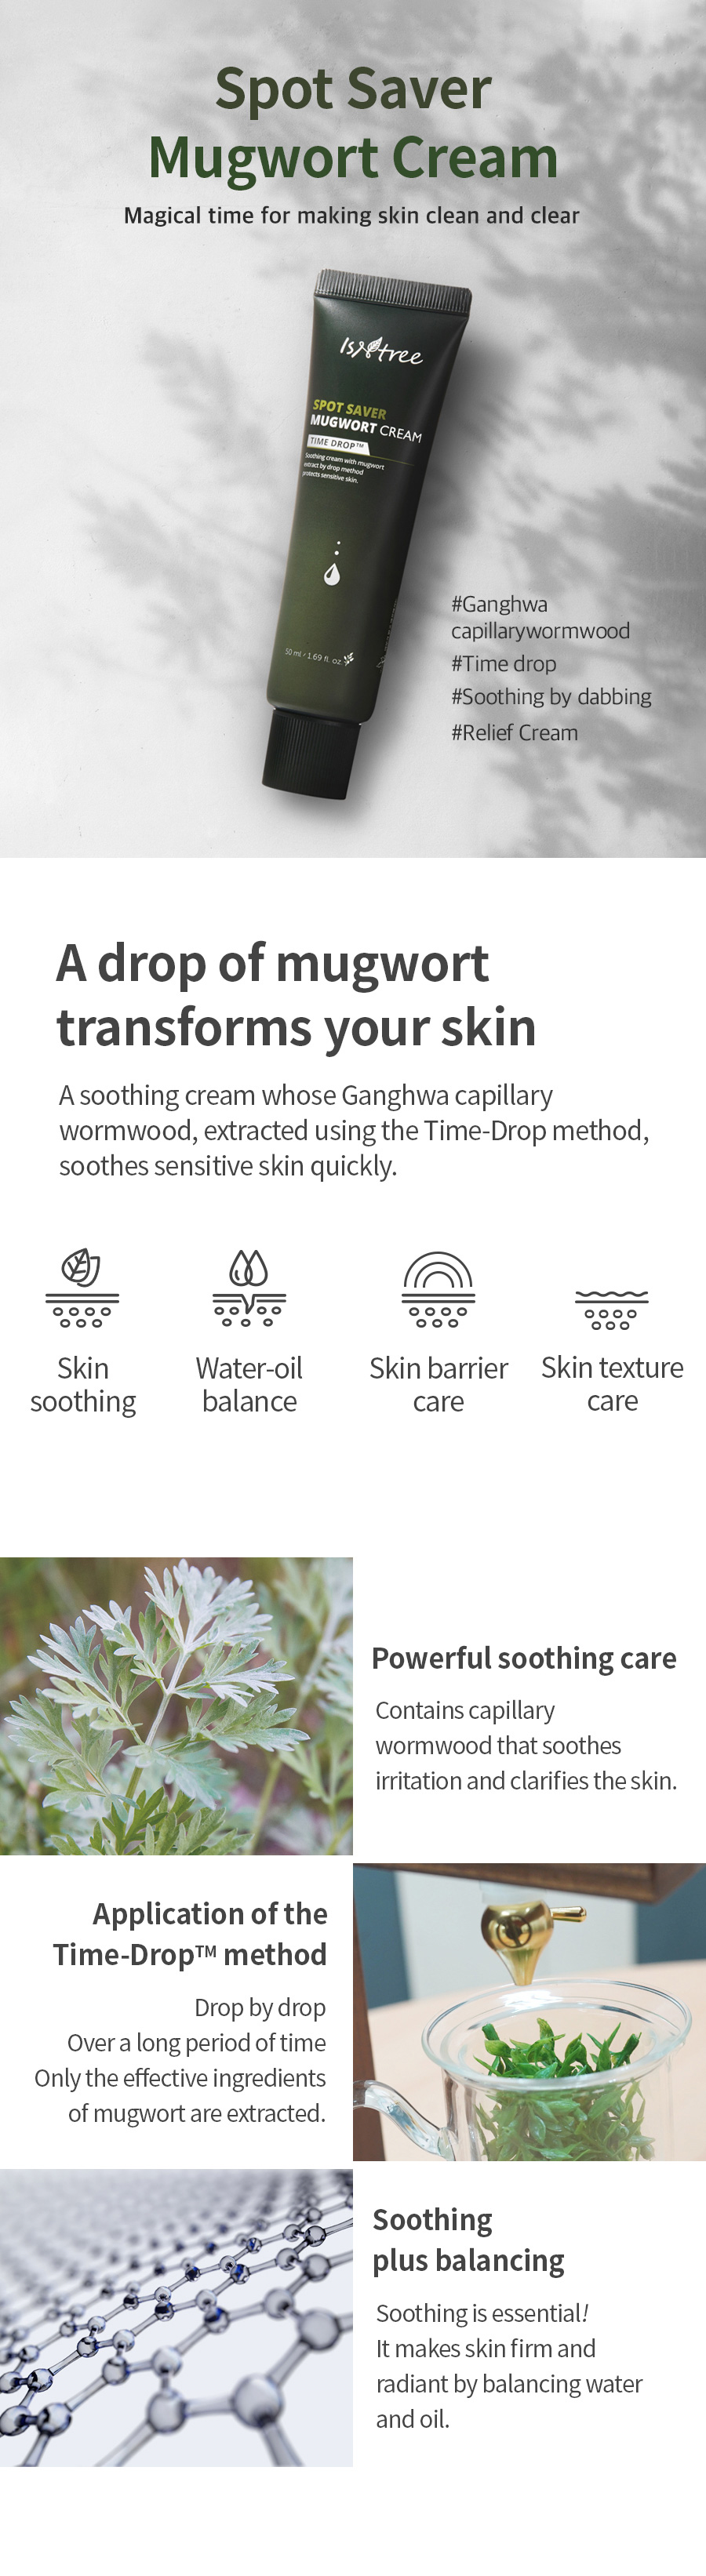 Spot Saver Mugwort Cream